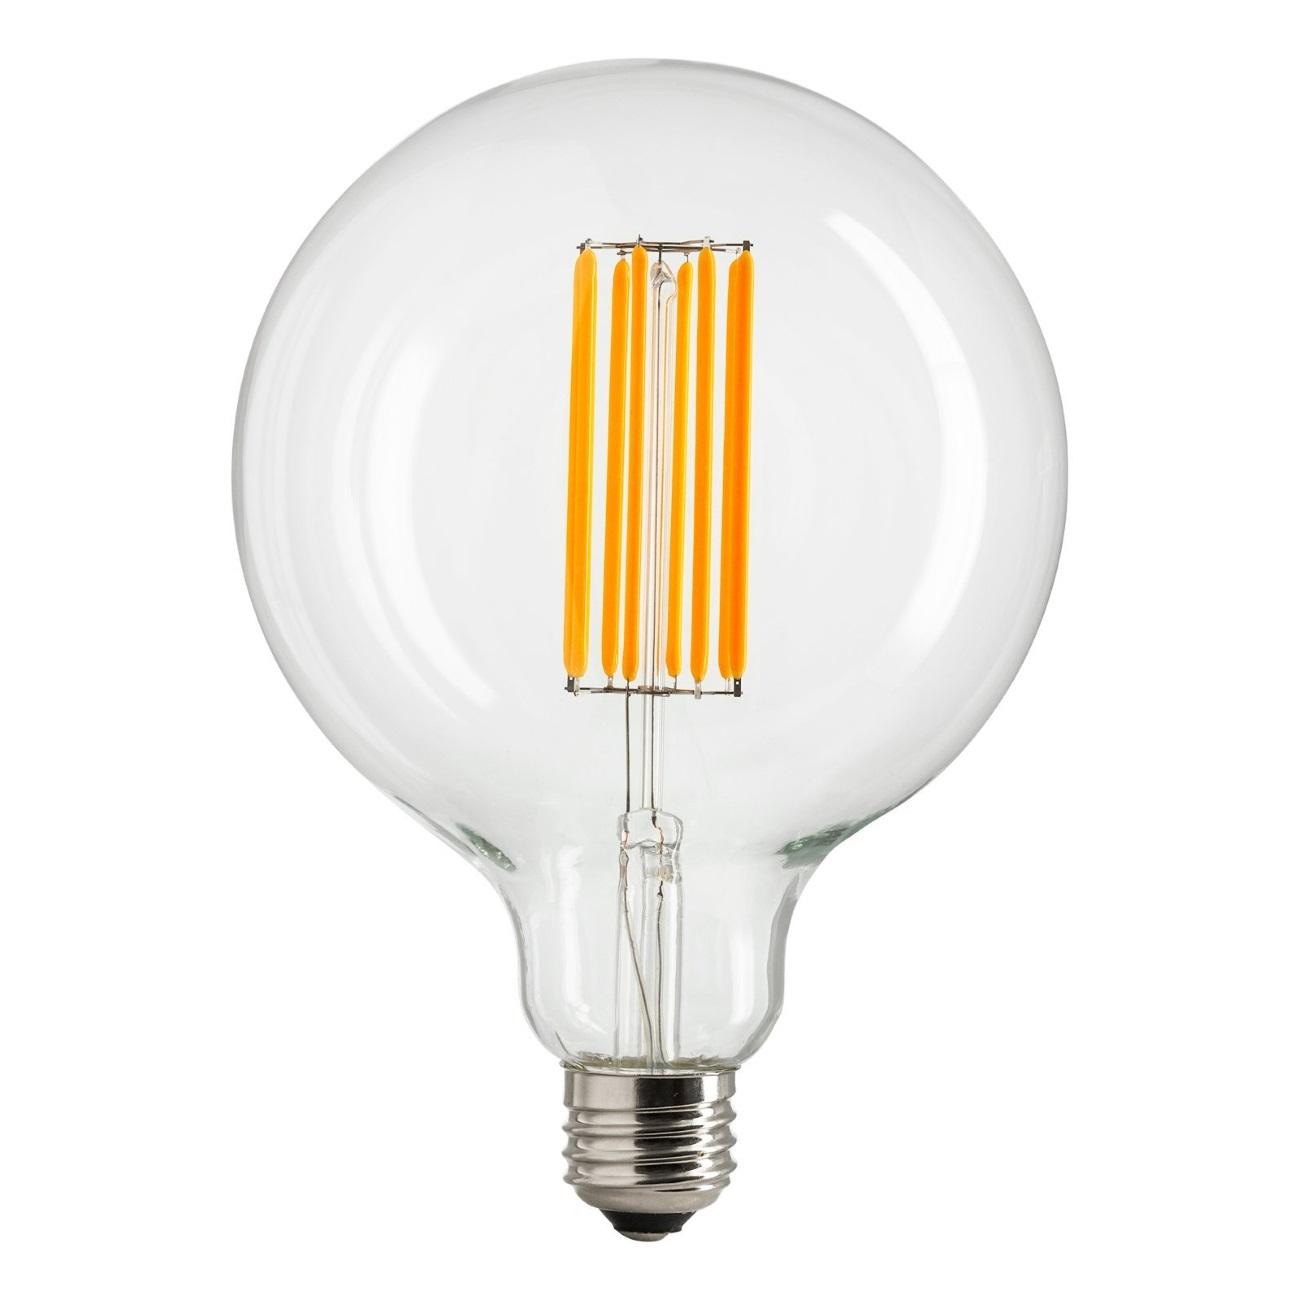 Stor LED Ø 125mm glödlampa, Strömshaga